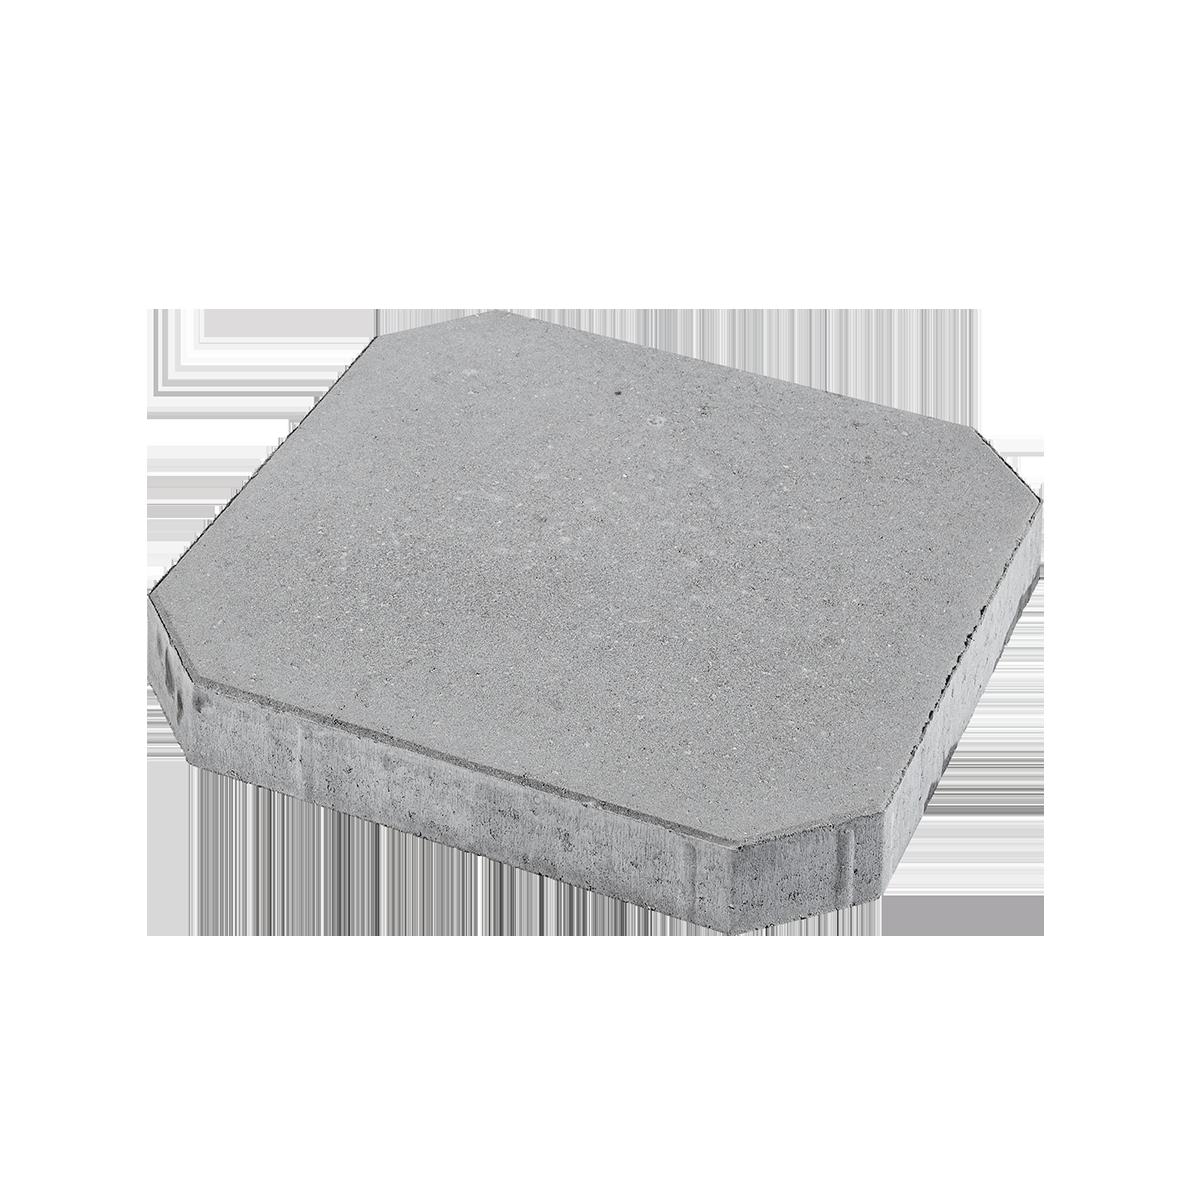 SquareLine® 50x50x6 cm Grå Normal